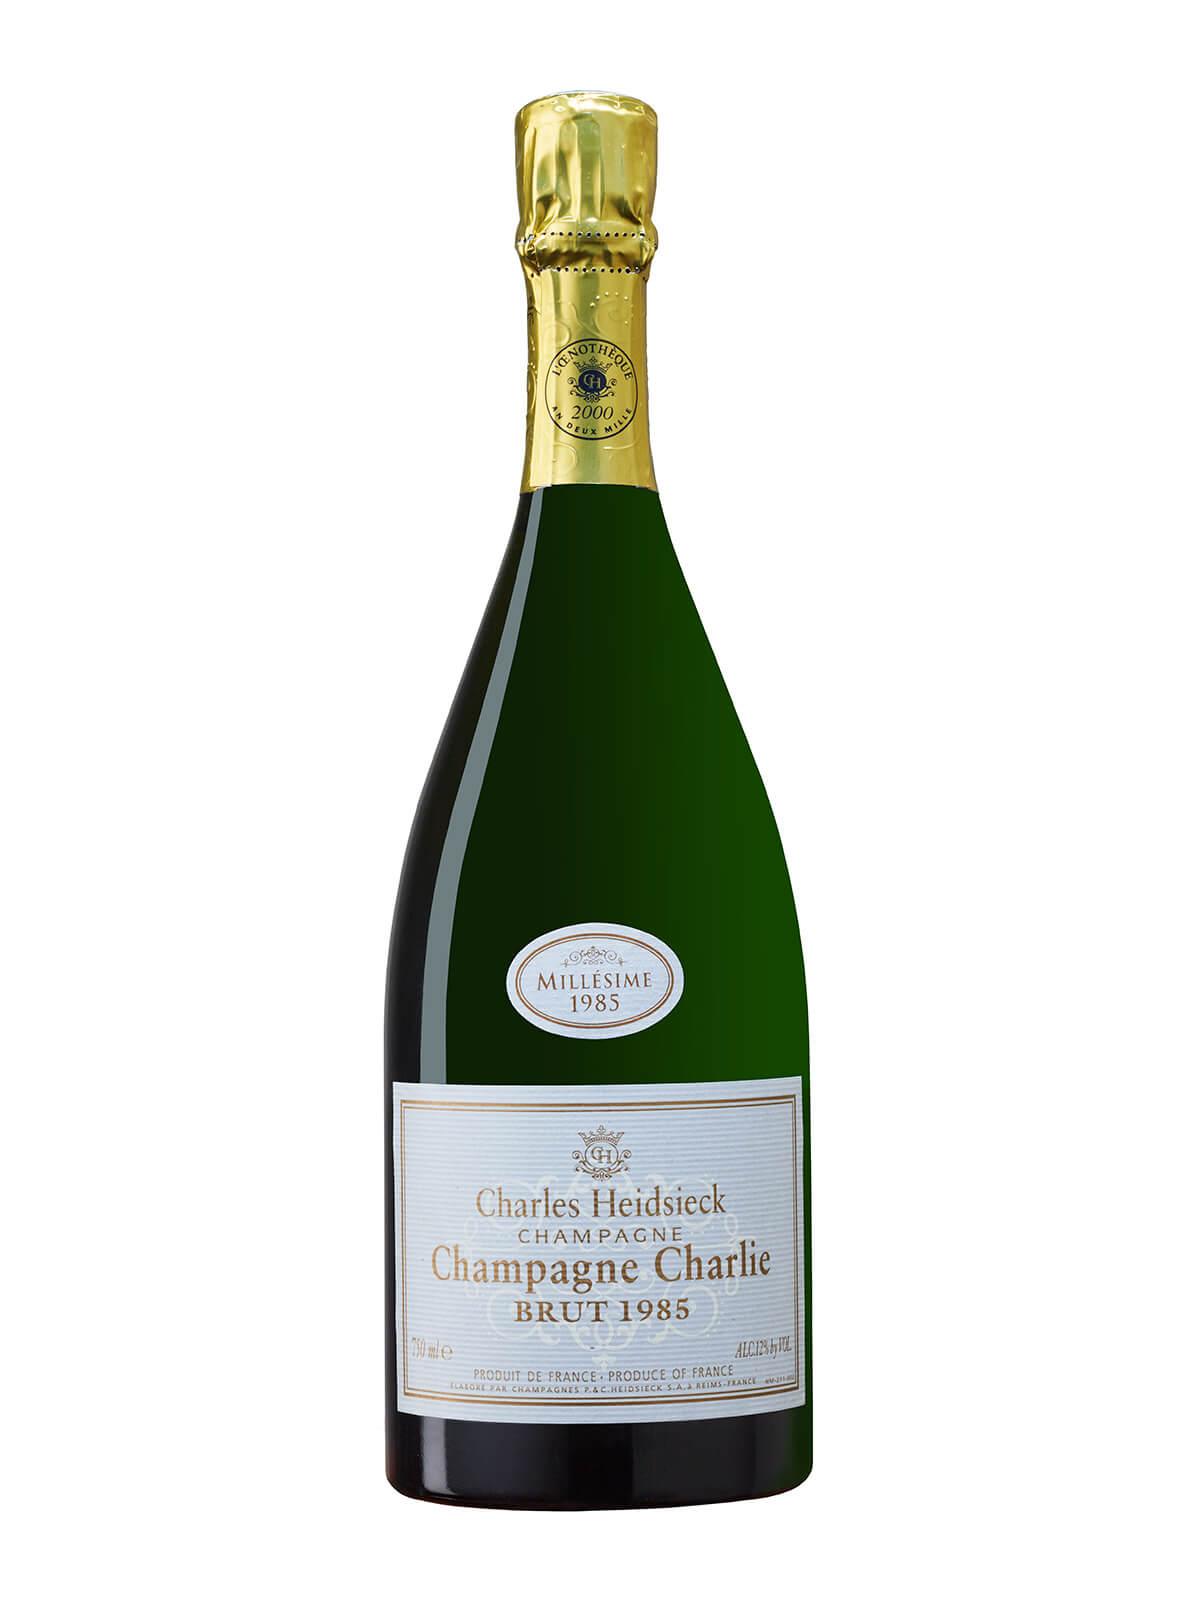 Charles Heidsieck Champagne Charlie Brut 1985